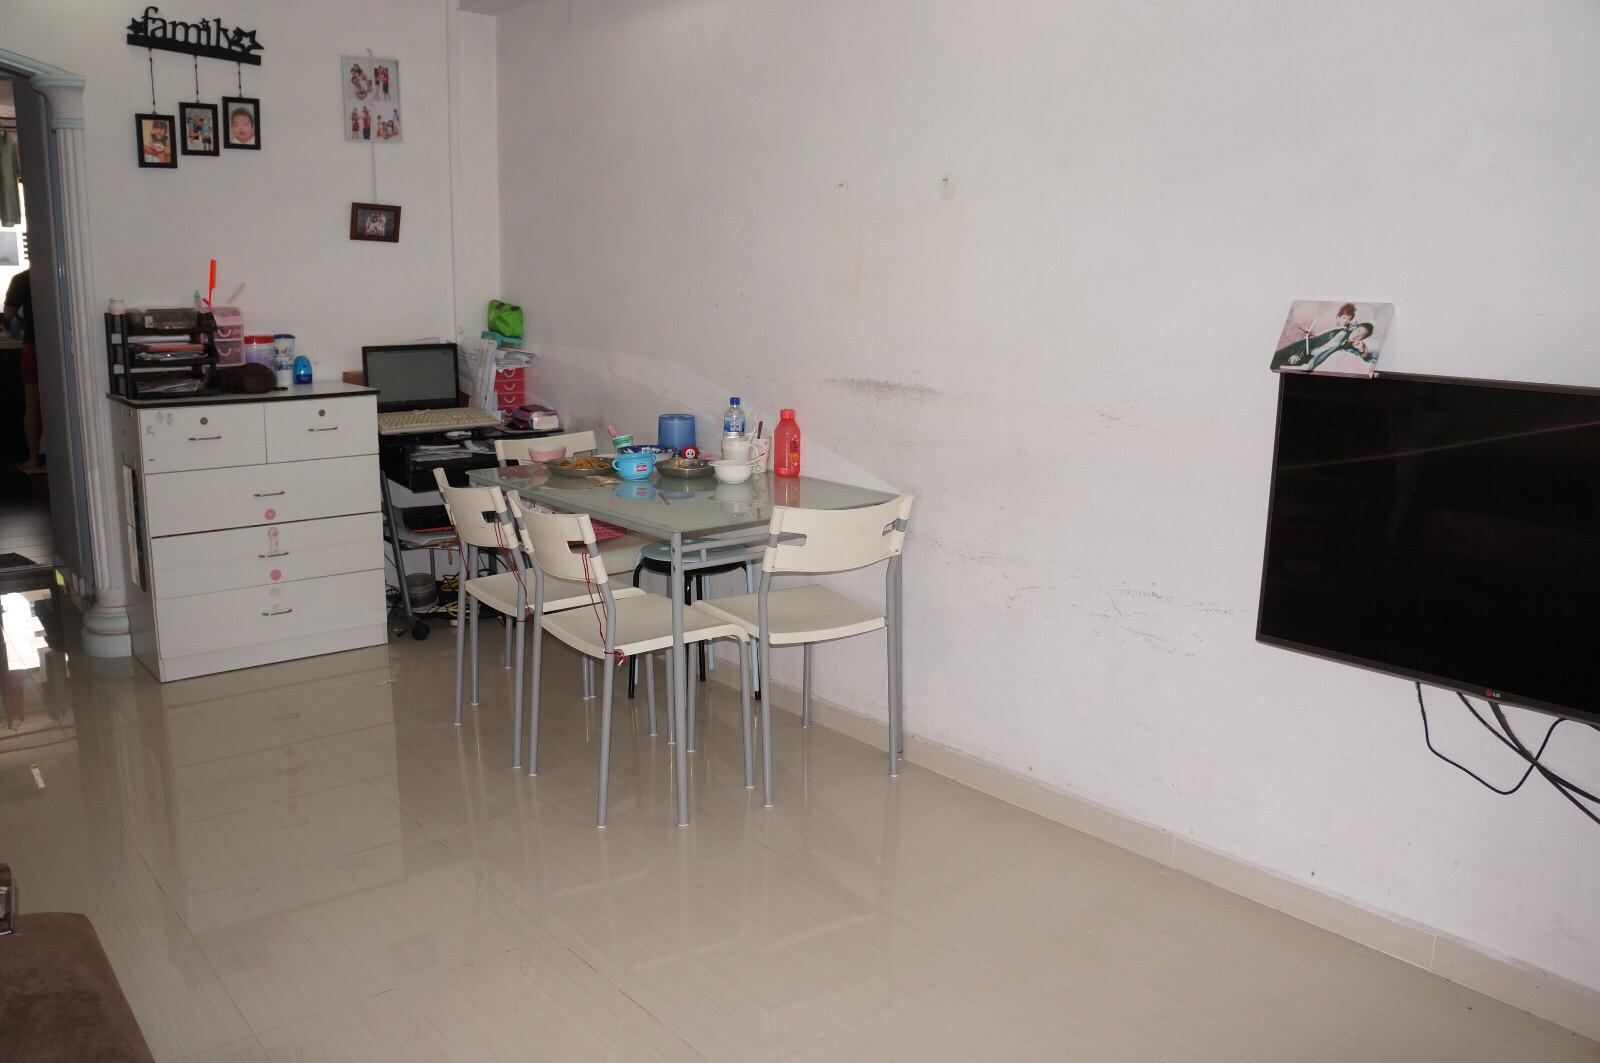 Hdb interior design in singapore 4 room flat at jurong east hwa li - Contact Daniel